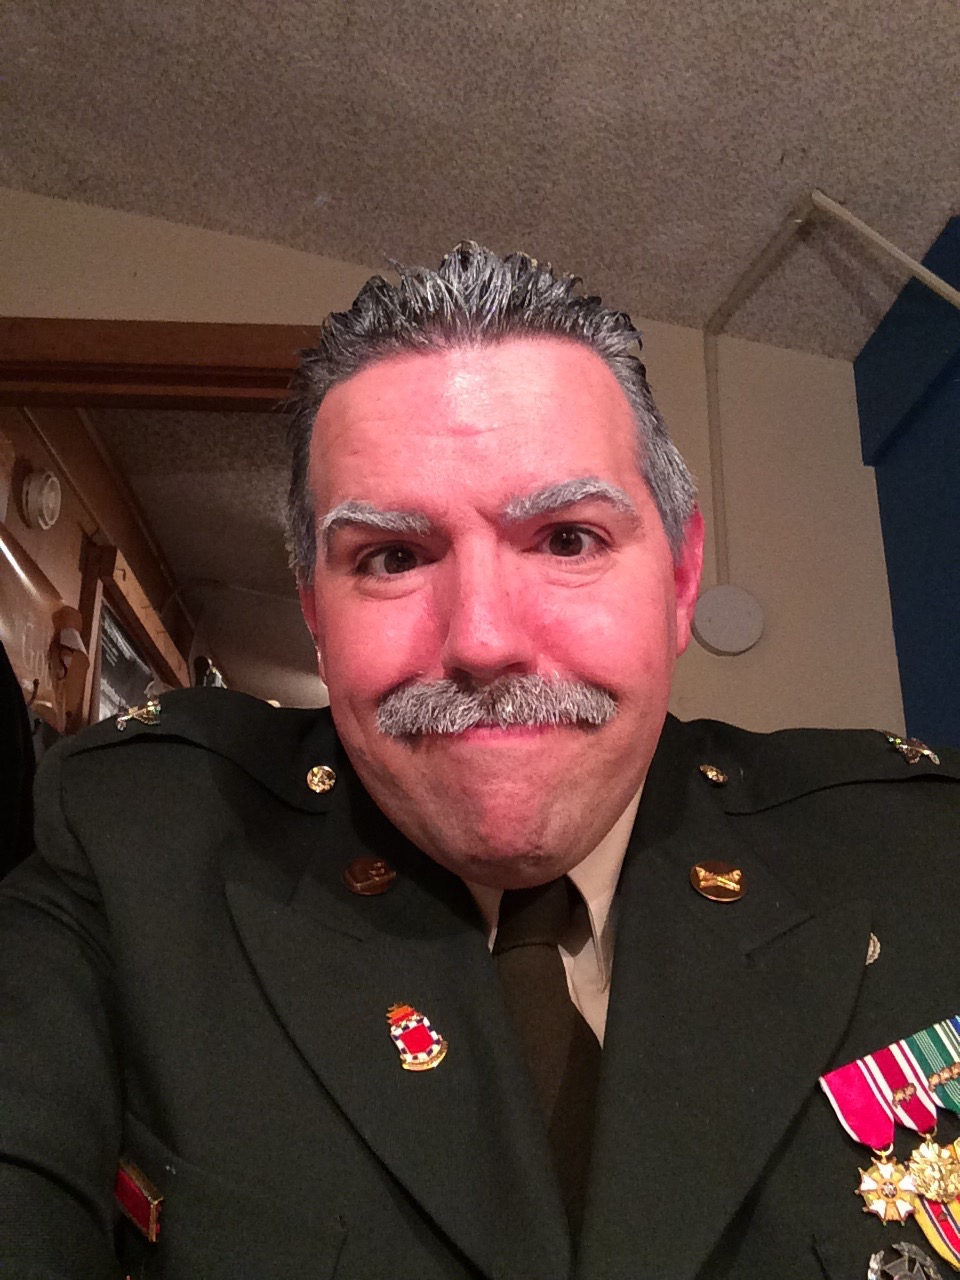 Major Malone